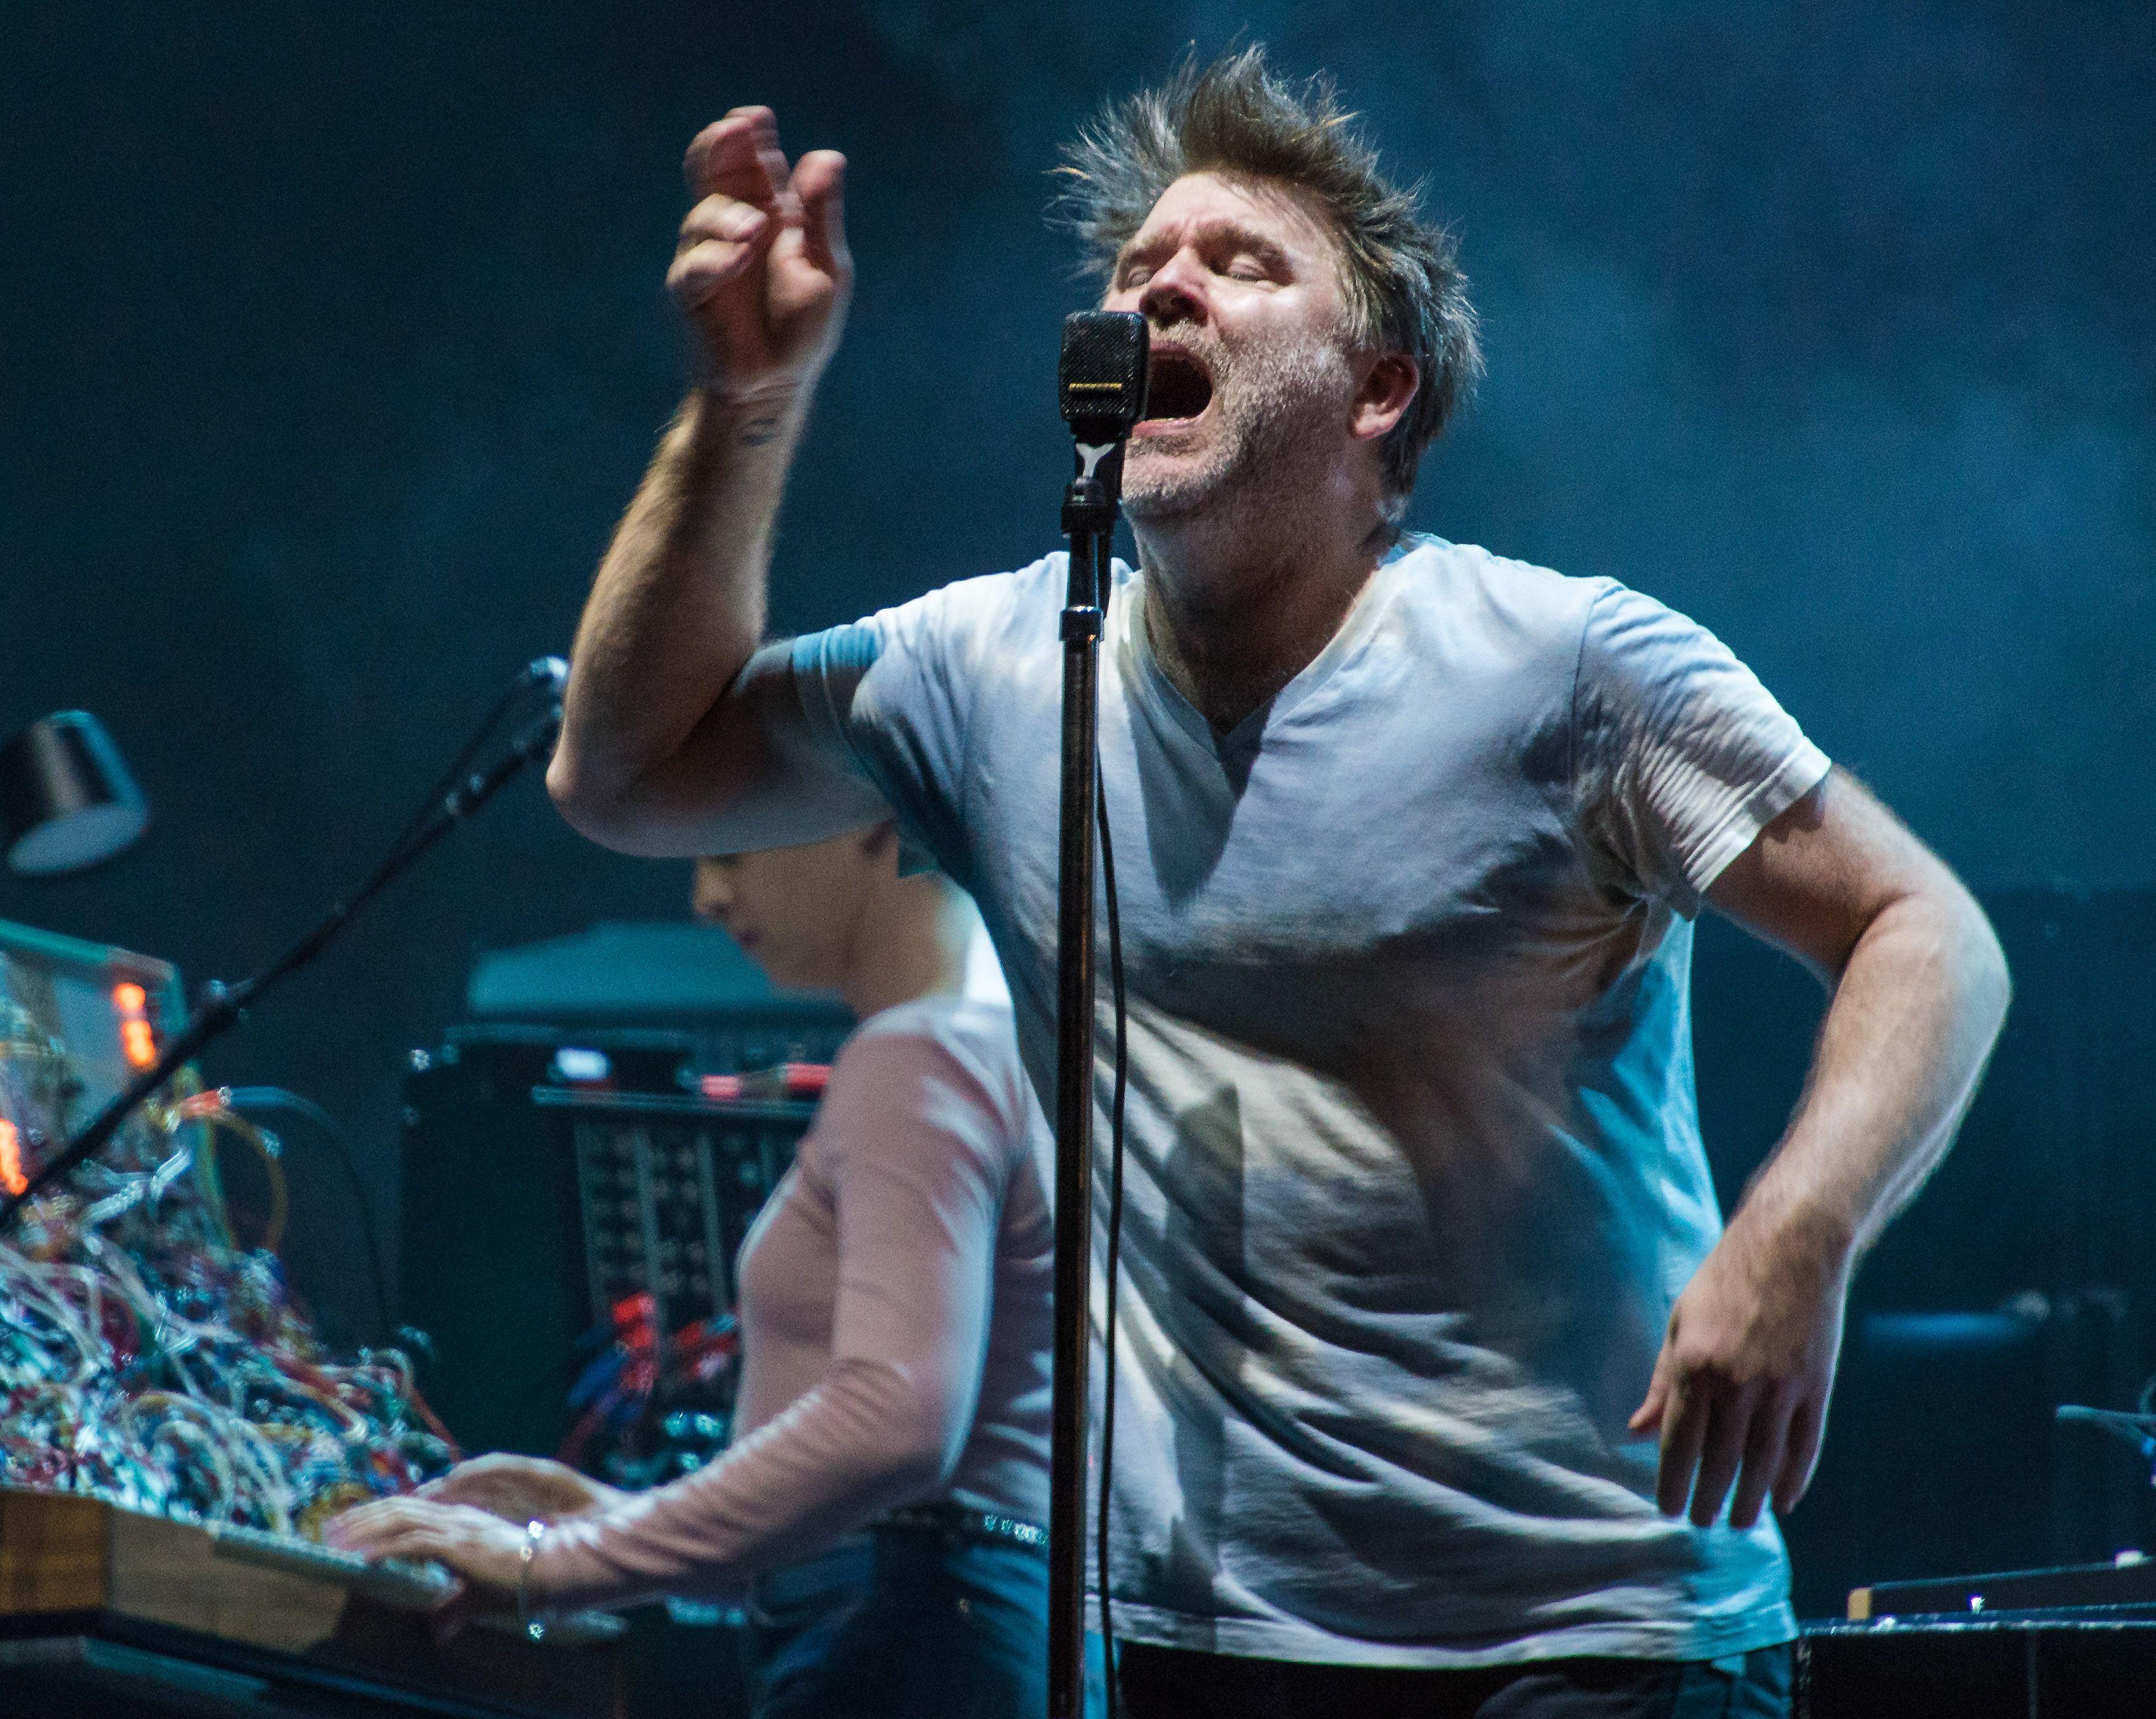 lcd soundsystem live album release date